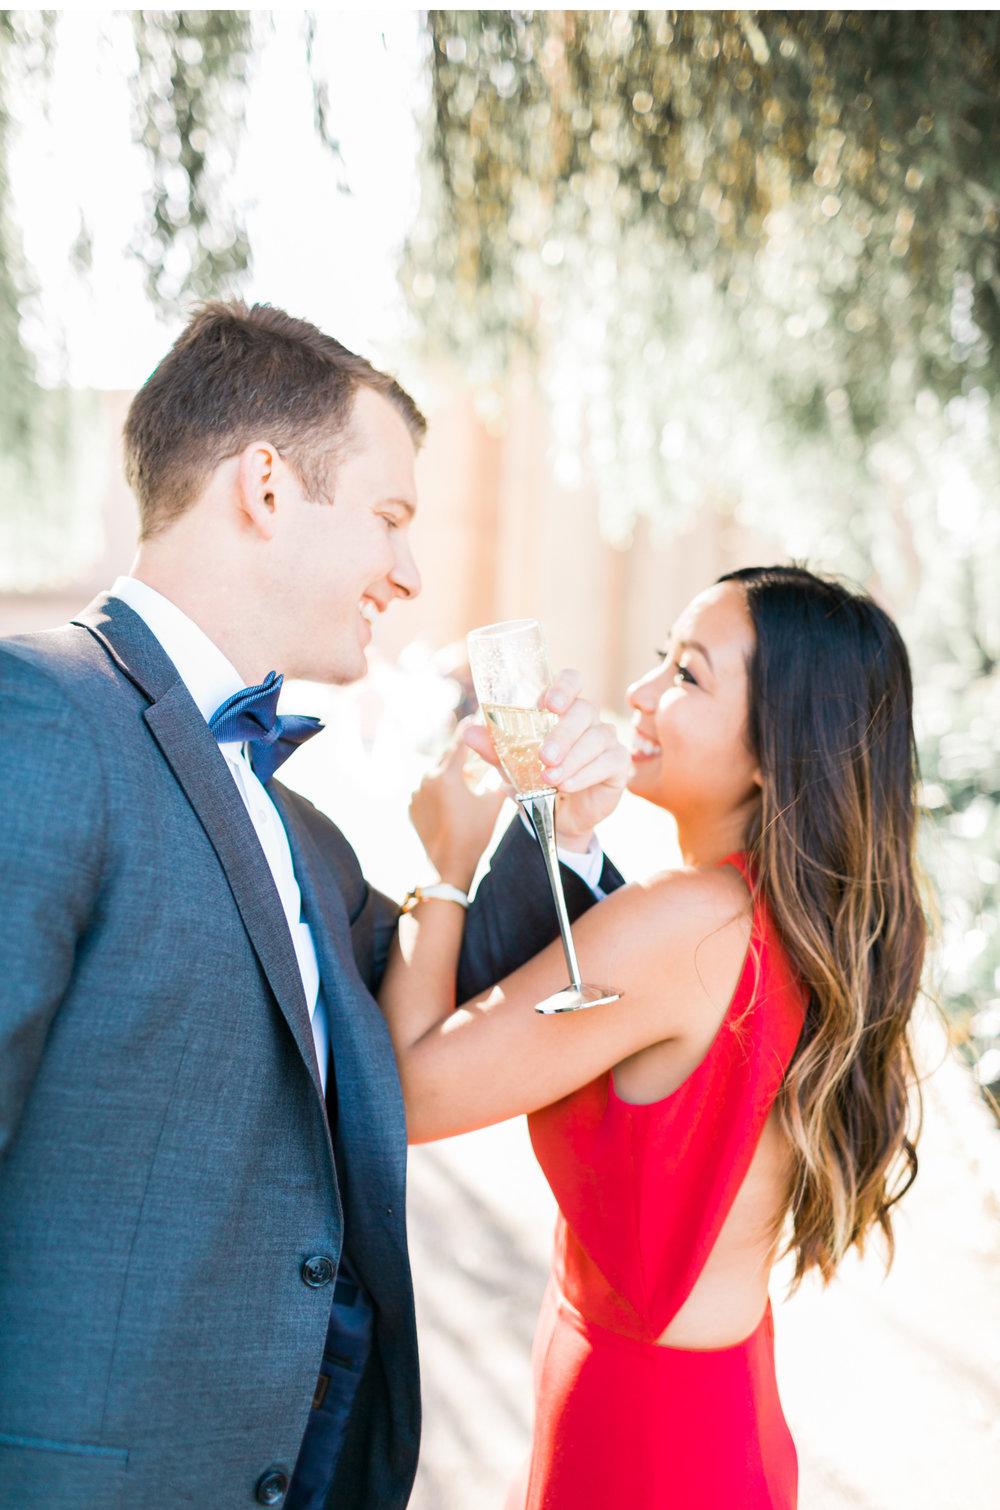 Malibu-Wedding-Photographer-Natalie-Schutt-Photography-Style-Me-Pretty_13.jpg